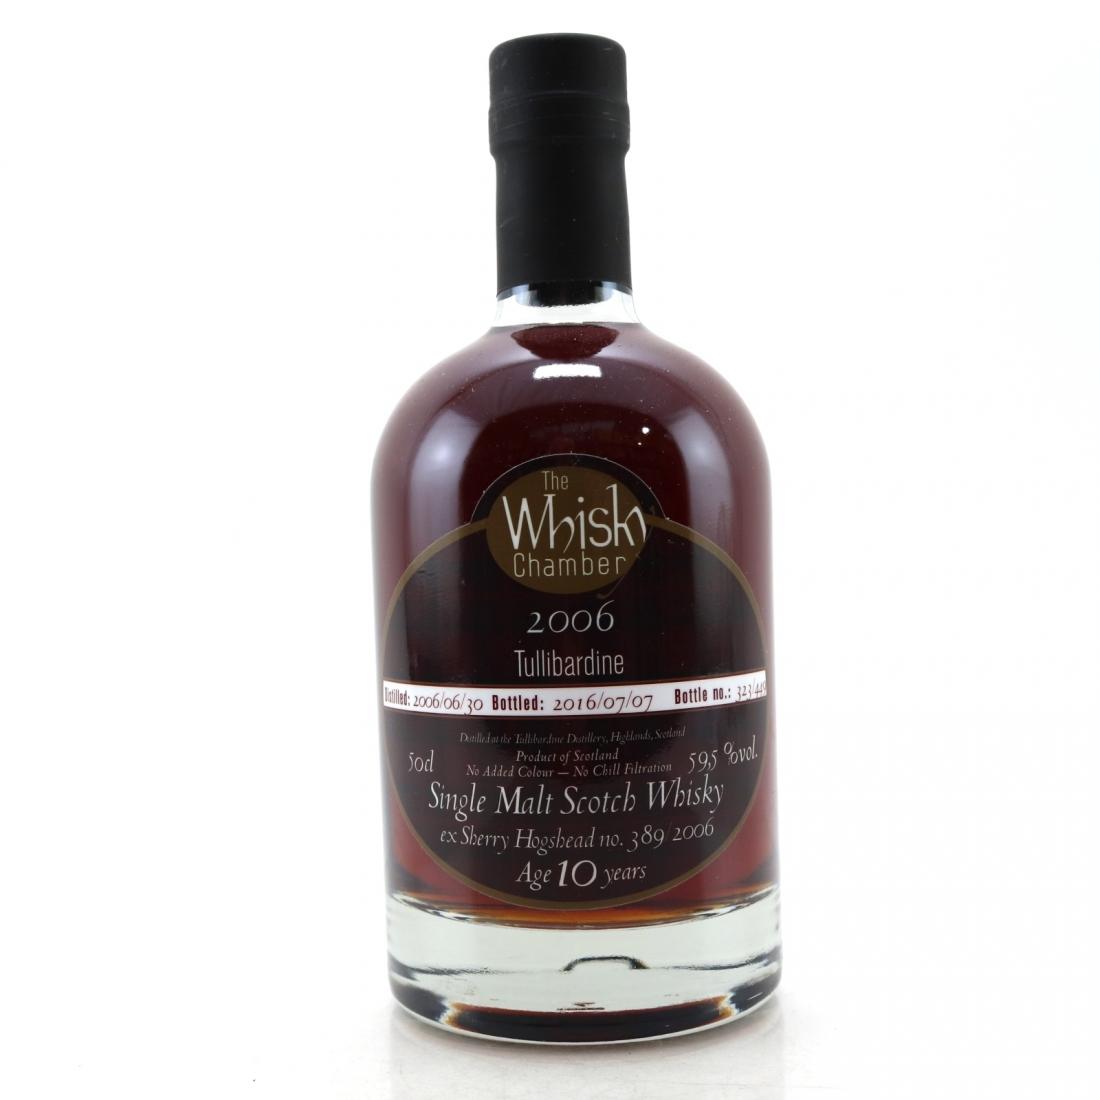 Tullibardine 2006 Whisky Chamber 10 Year Old 50cl